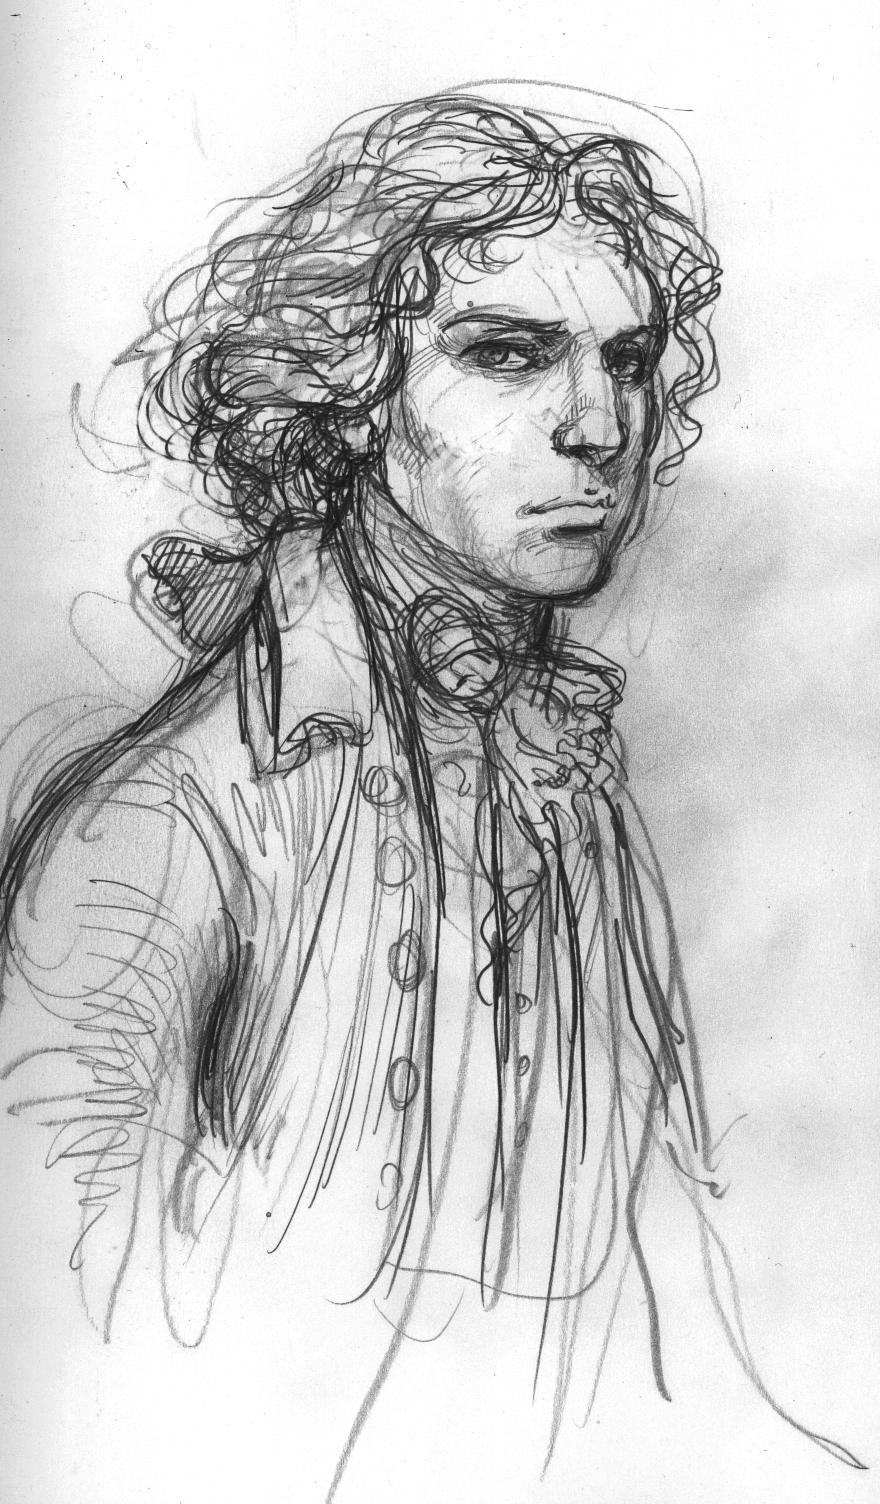 Prince Andar by suburbanbeatnik